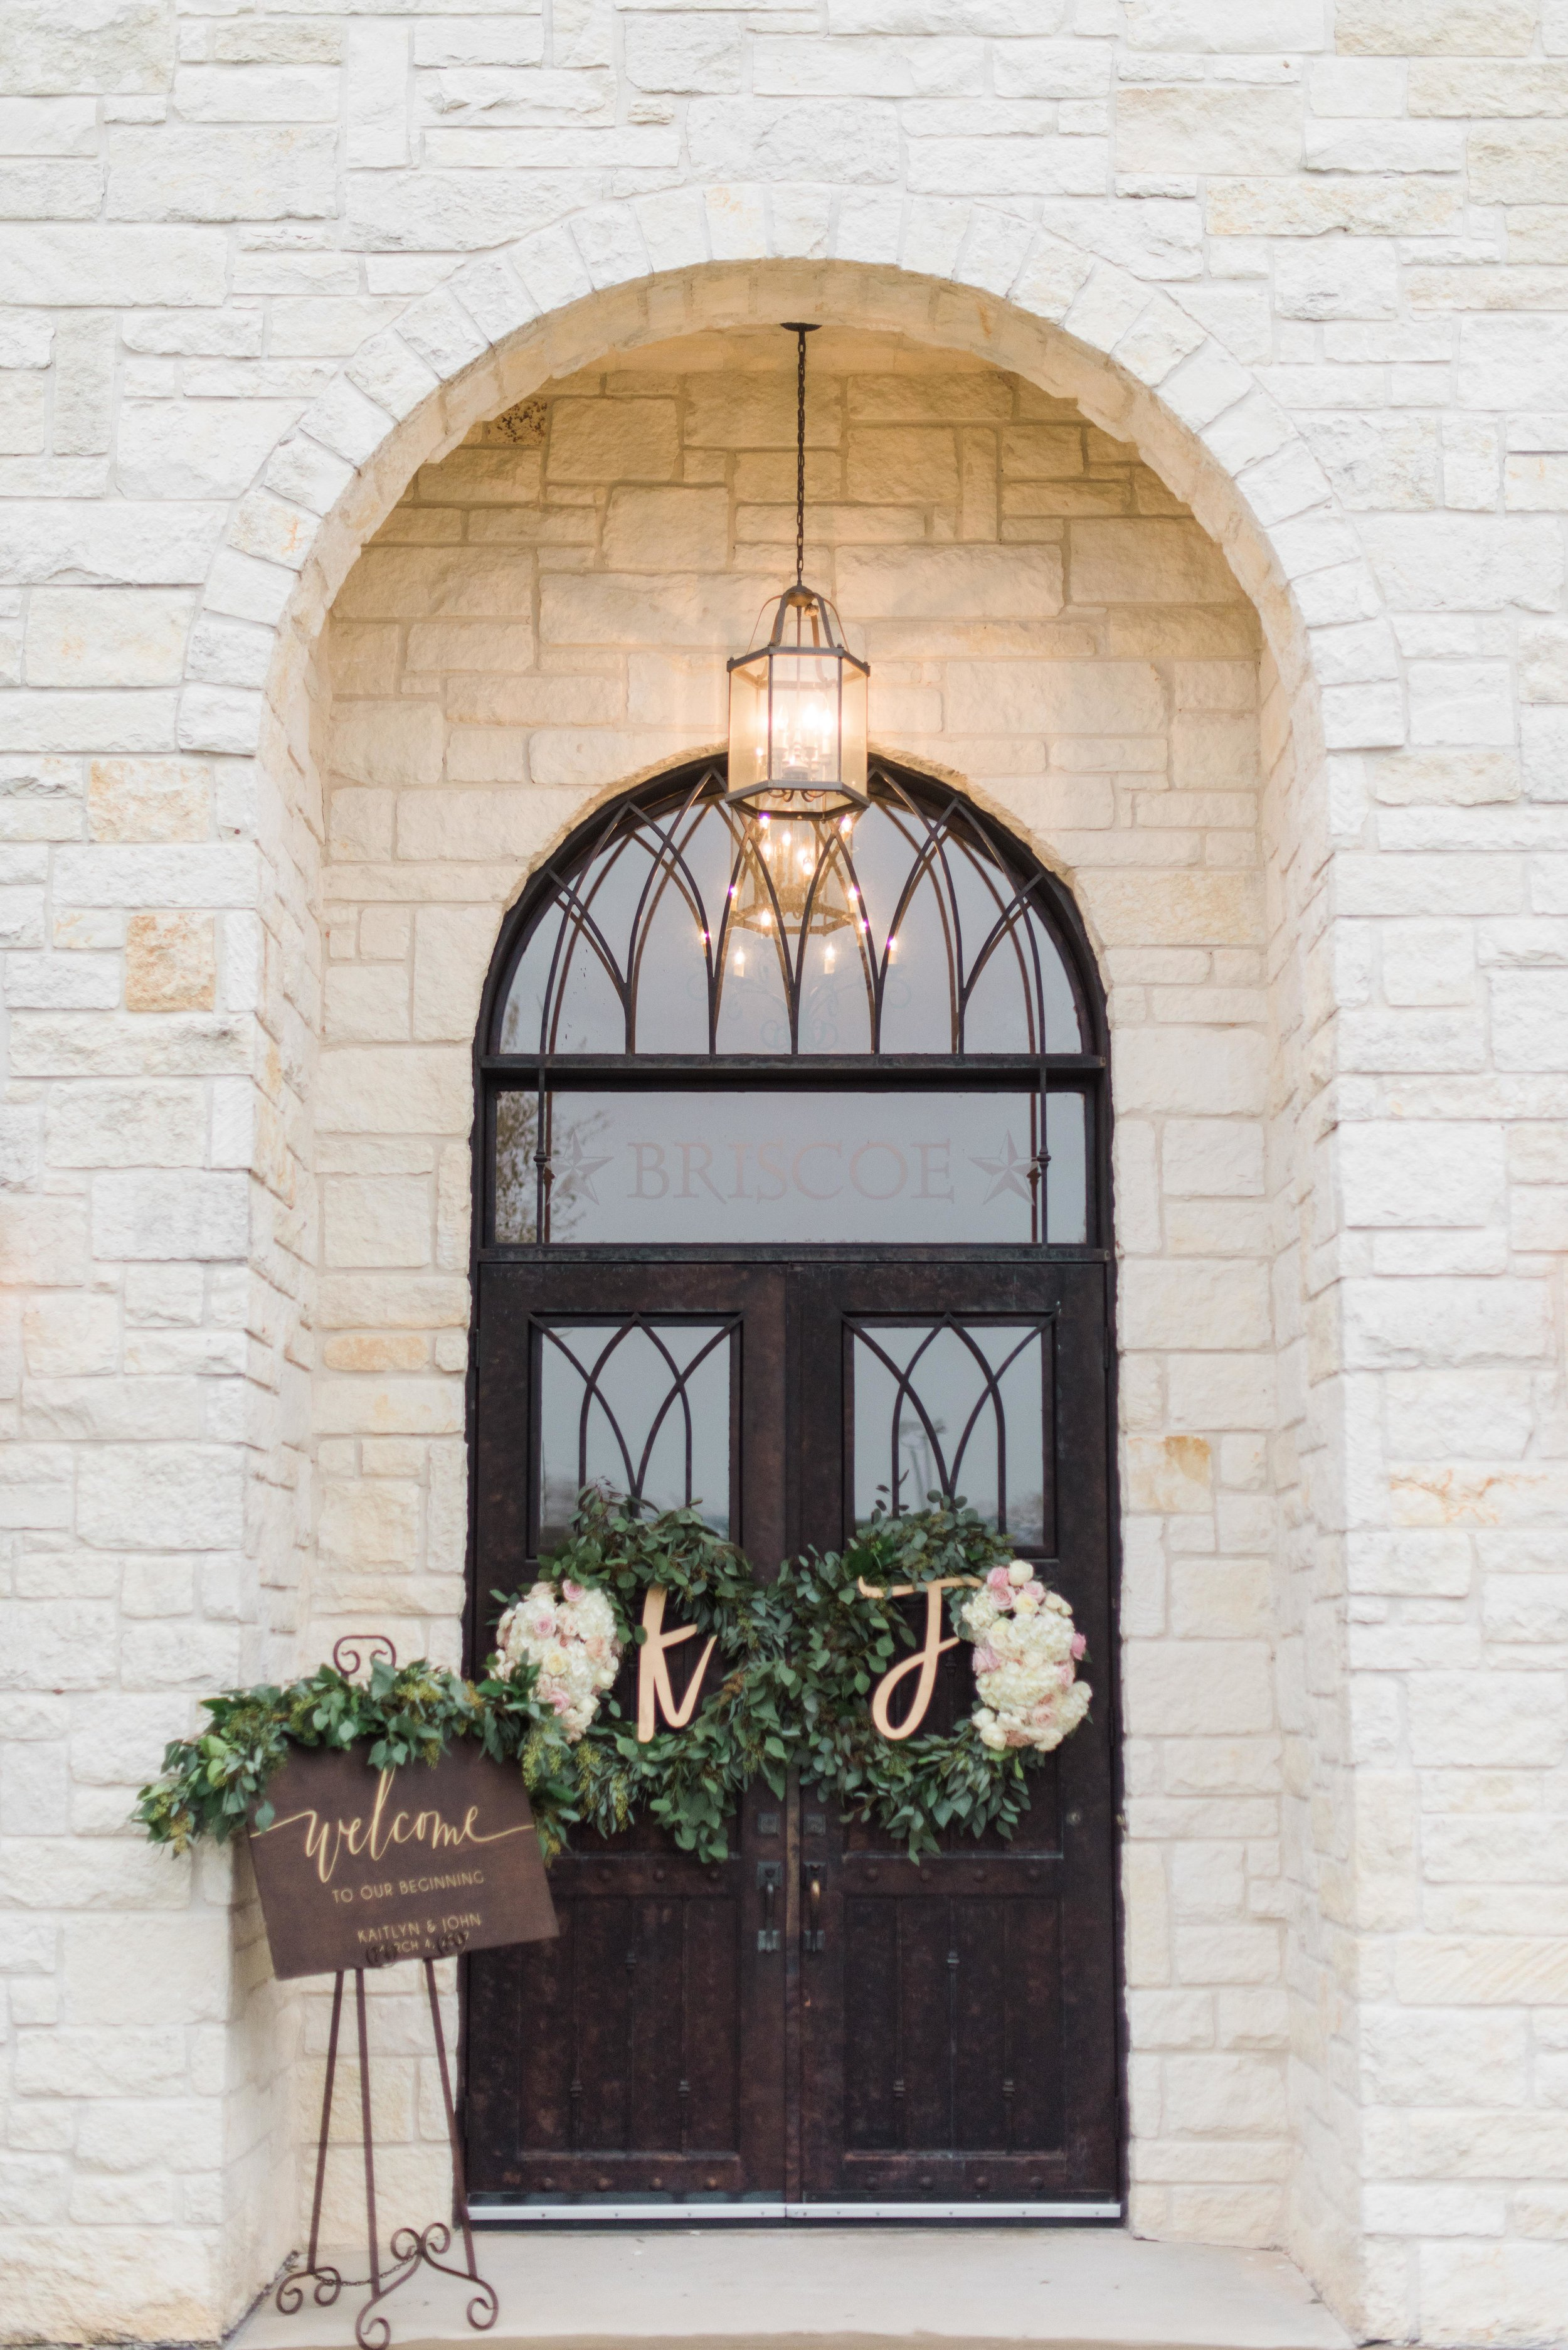 Briscoe-Manor-Houston-Wedding-Photographer-Modern-Luxury-Weddings-Dana-Fernandez-Photograpy-Fine-Art-Photographer-Houston-Film-Destination-PNW-Wedding-Photographer-3.jpg